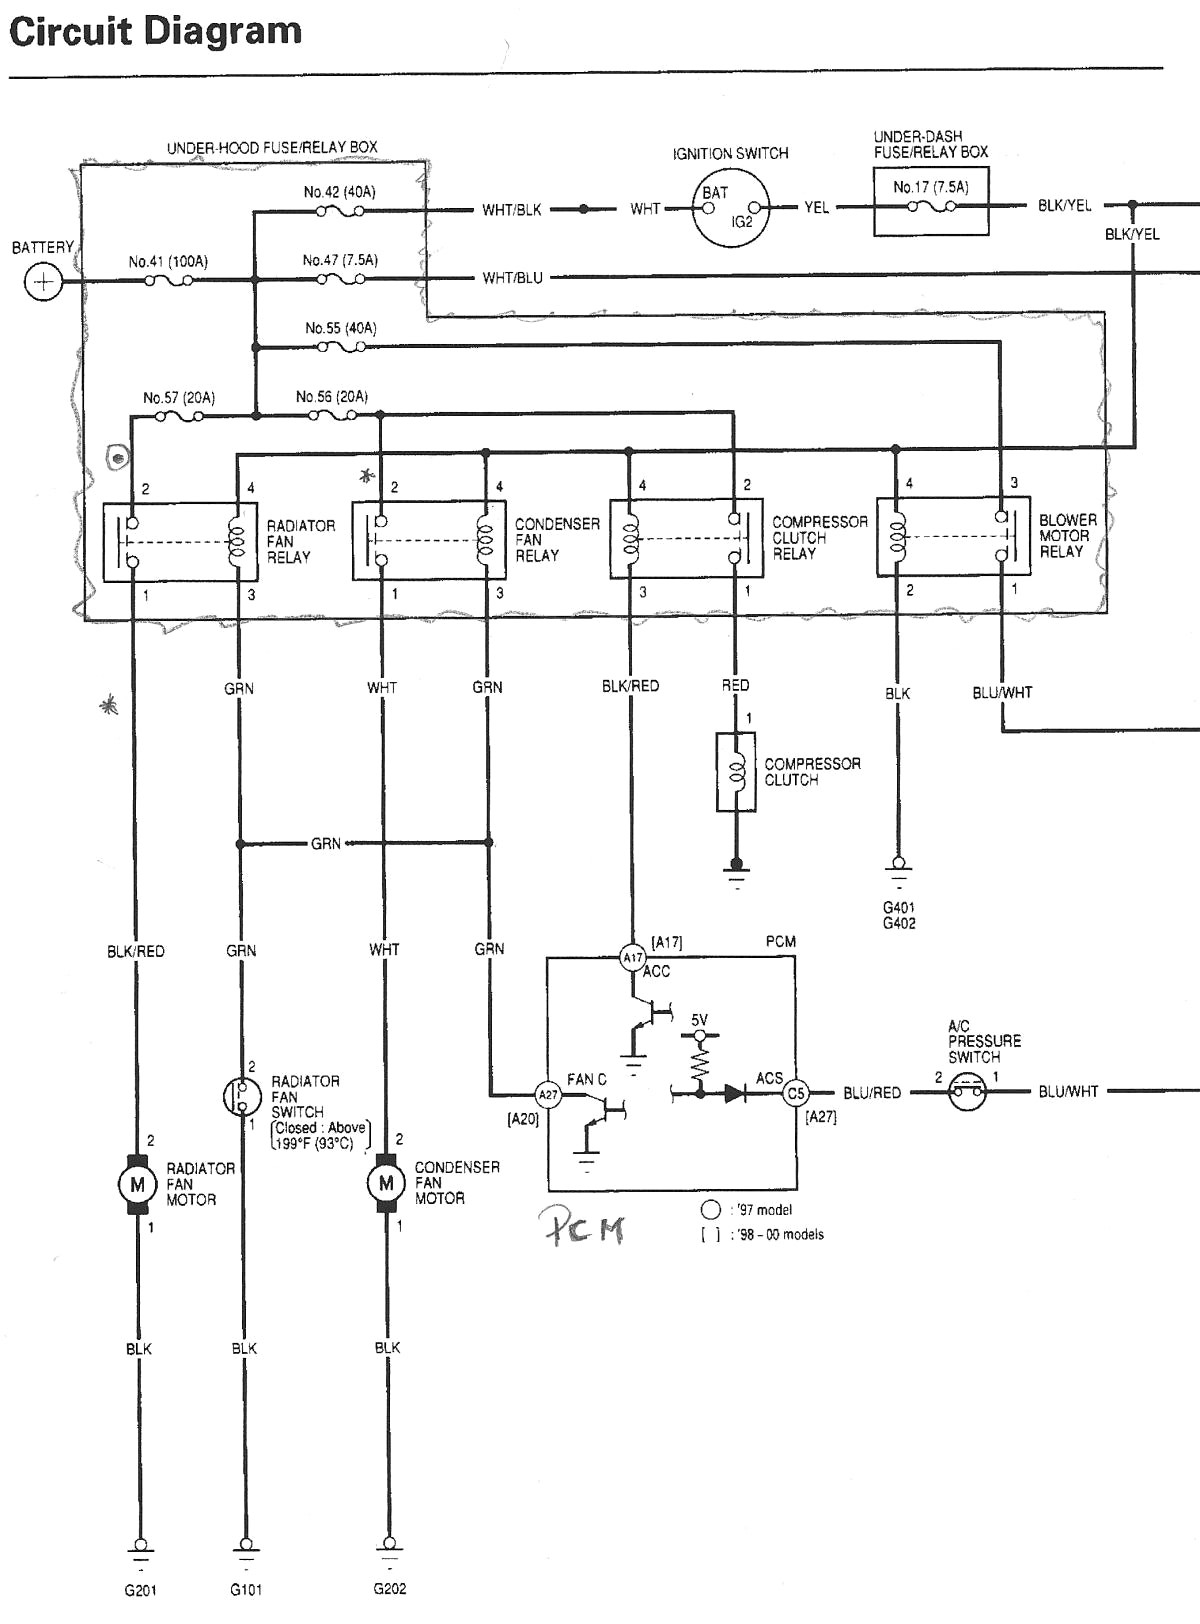 2003 Honda Odyssey Engine Diagram 2003 Honda Accord Stereo Wiring Diagram and Adorable Blurts Of 2003 Honda Odyssey Engine Diagram